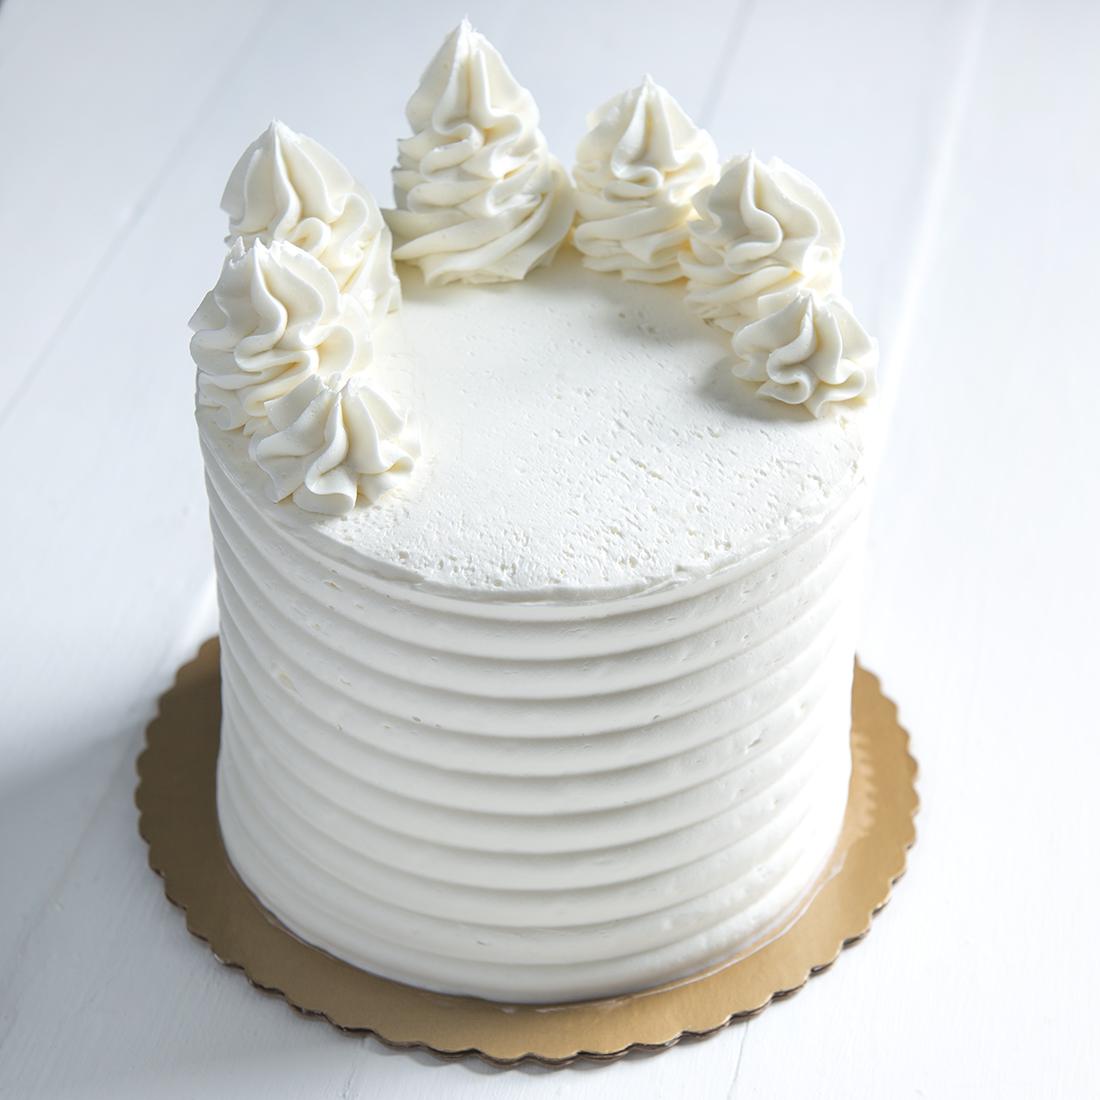 "Vegan Simply Vanilla - Vanilla cake layered with vanilla buttercream6"" $40 9"" 55 10"" 70 12"" 90"